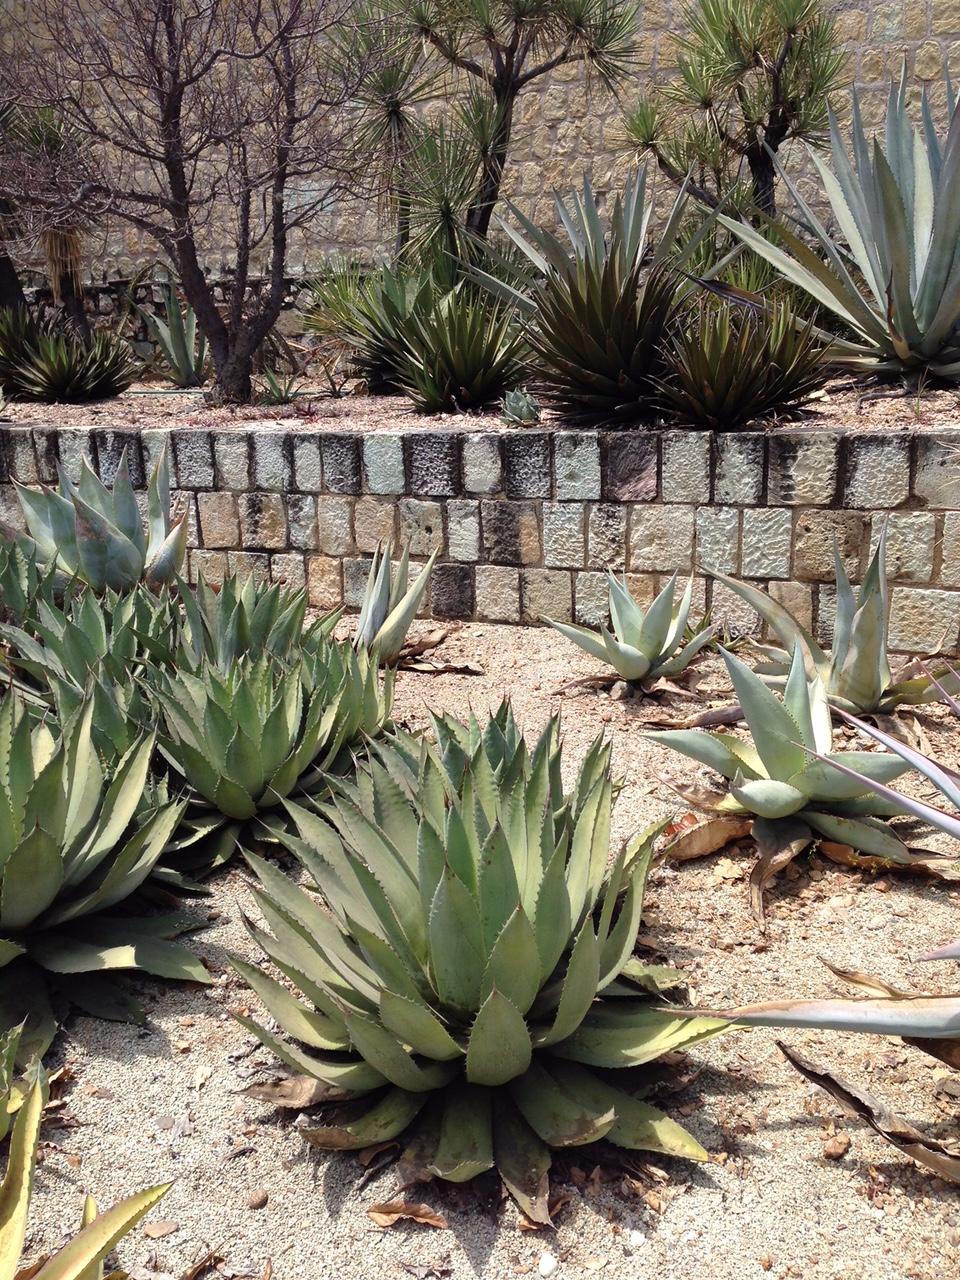 Agave in Oaxaca